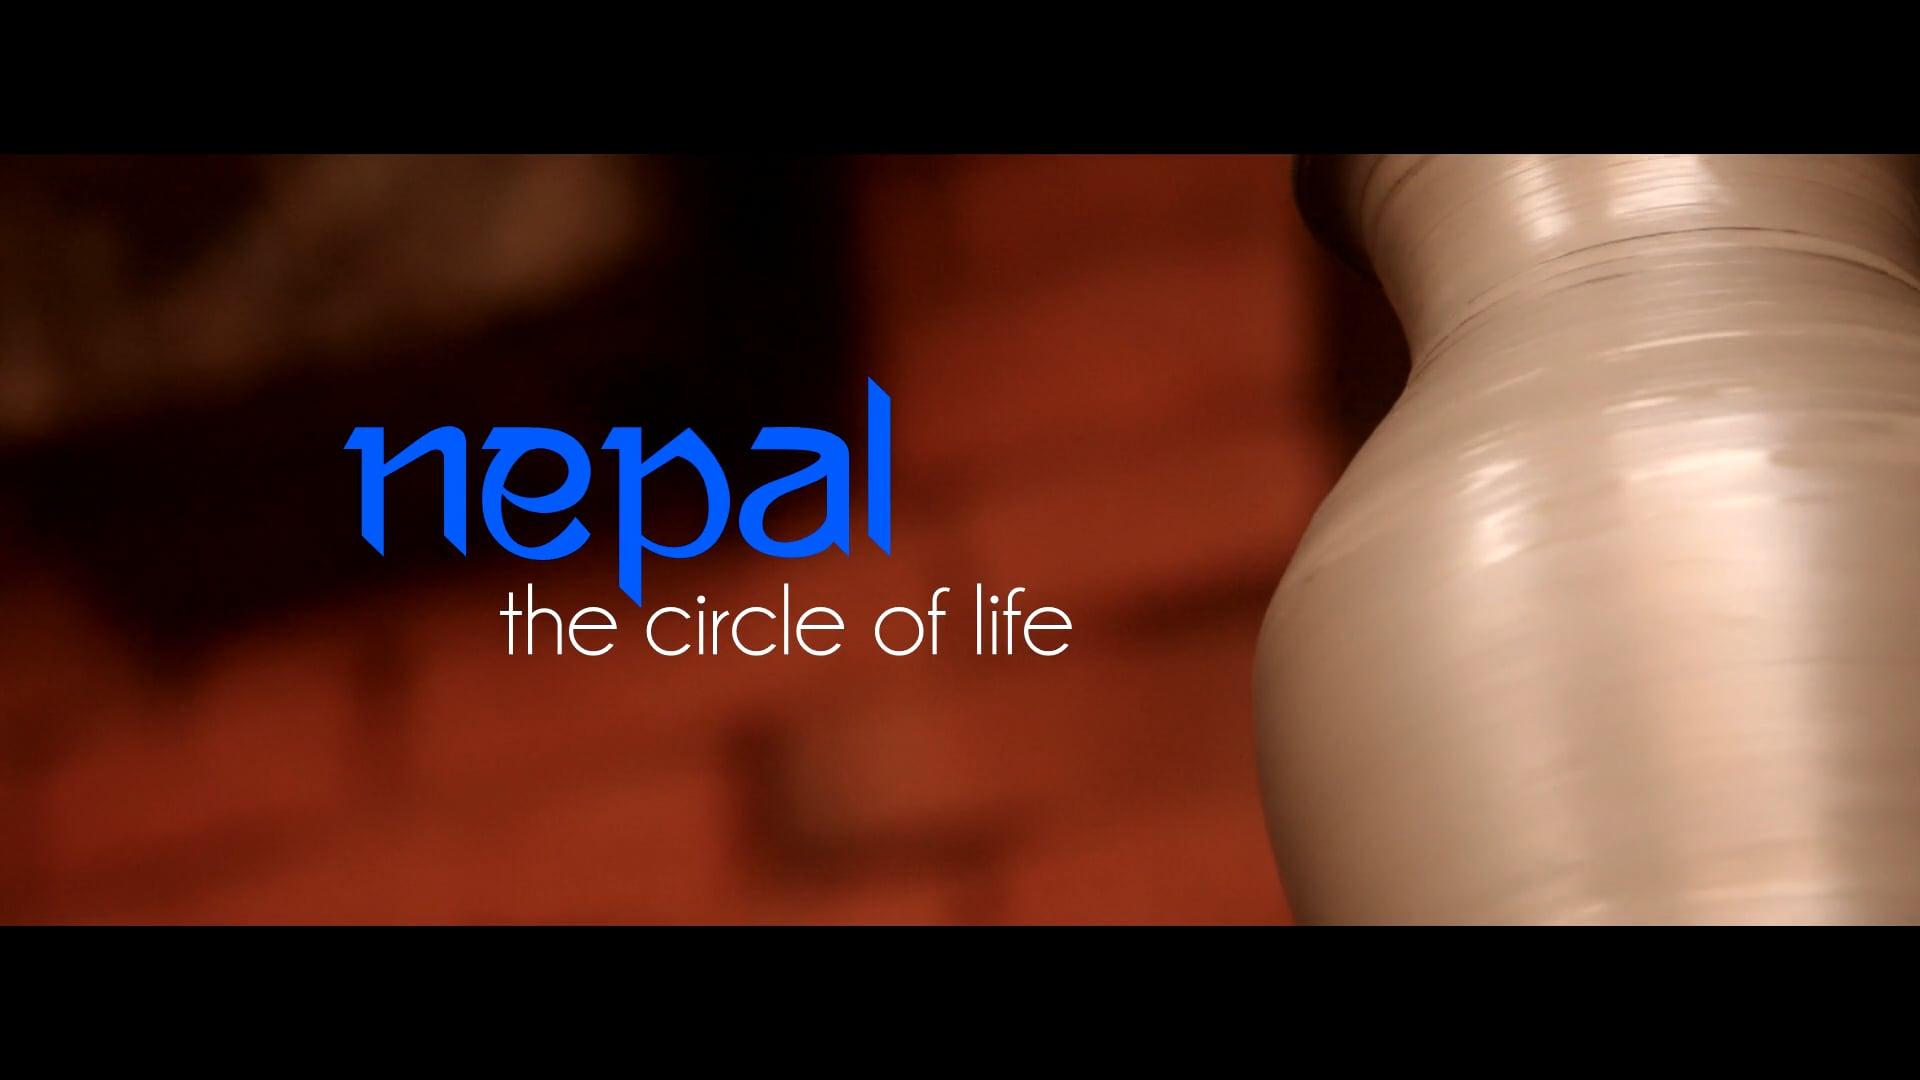 Nepal, the circle of life